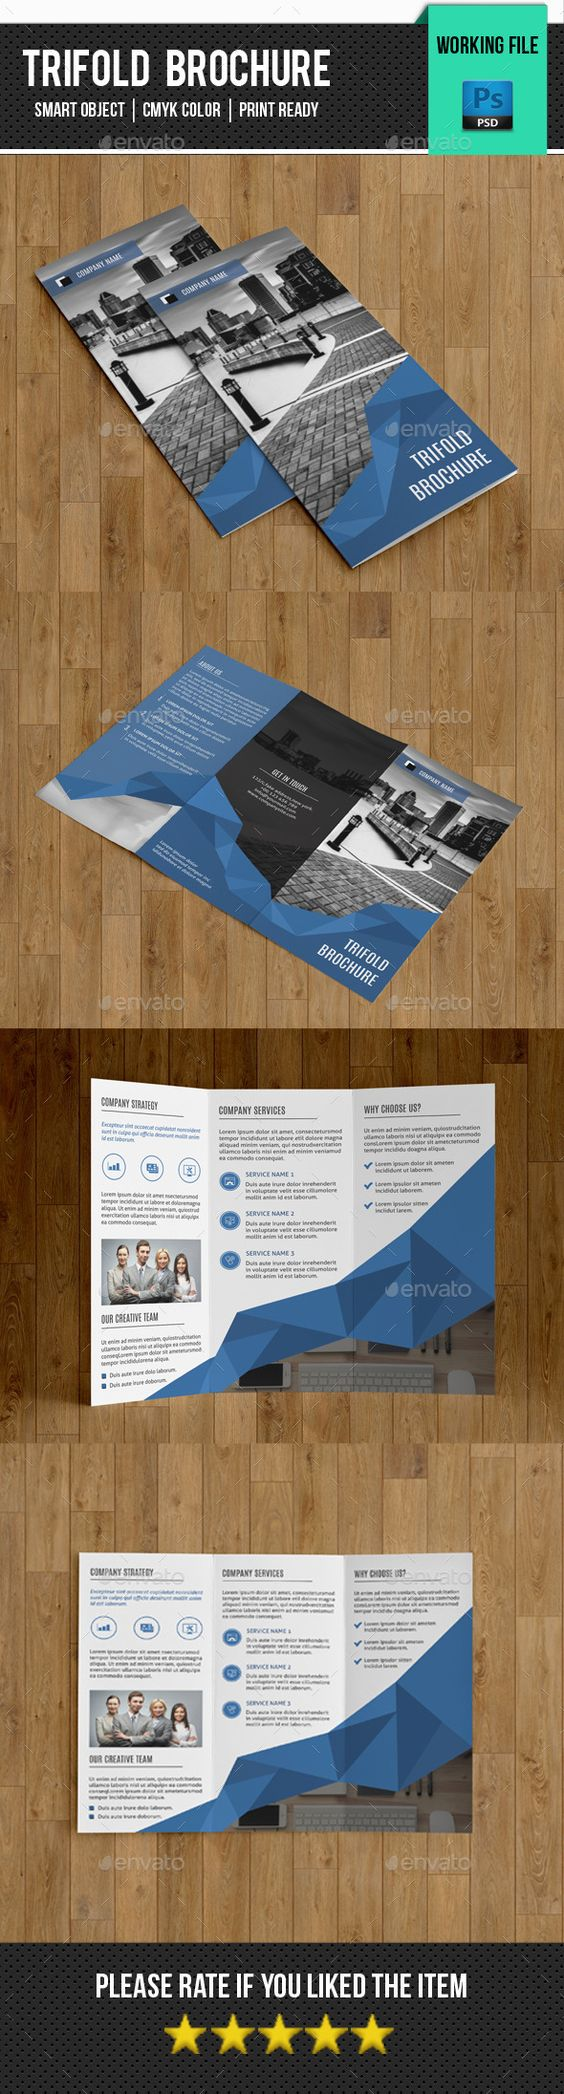 Corporate Trifold Brochure Design Tempalte Download: http://graphicriver.net/item/corporate-trifold-brochurev251/12950797?ref=ksioks